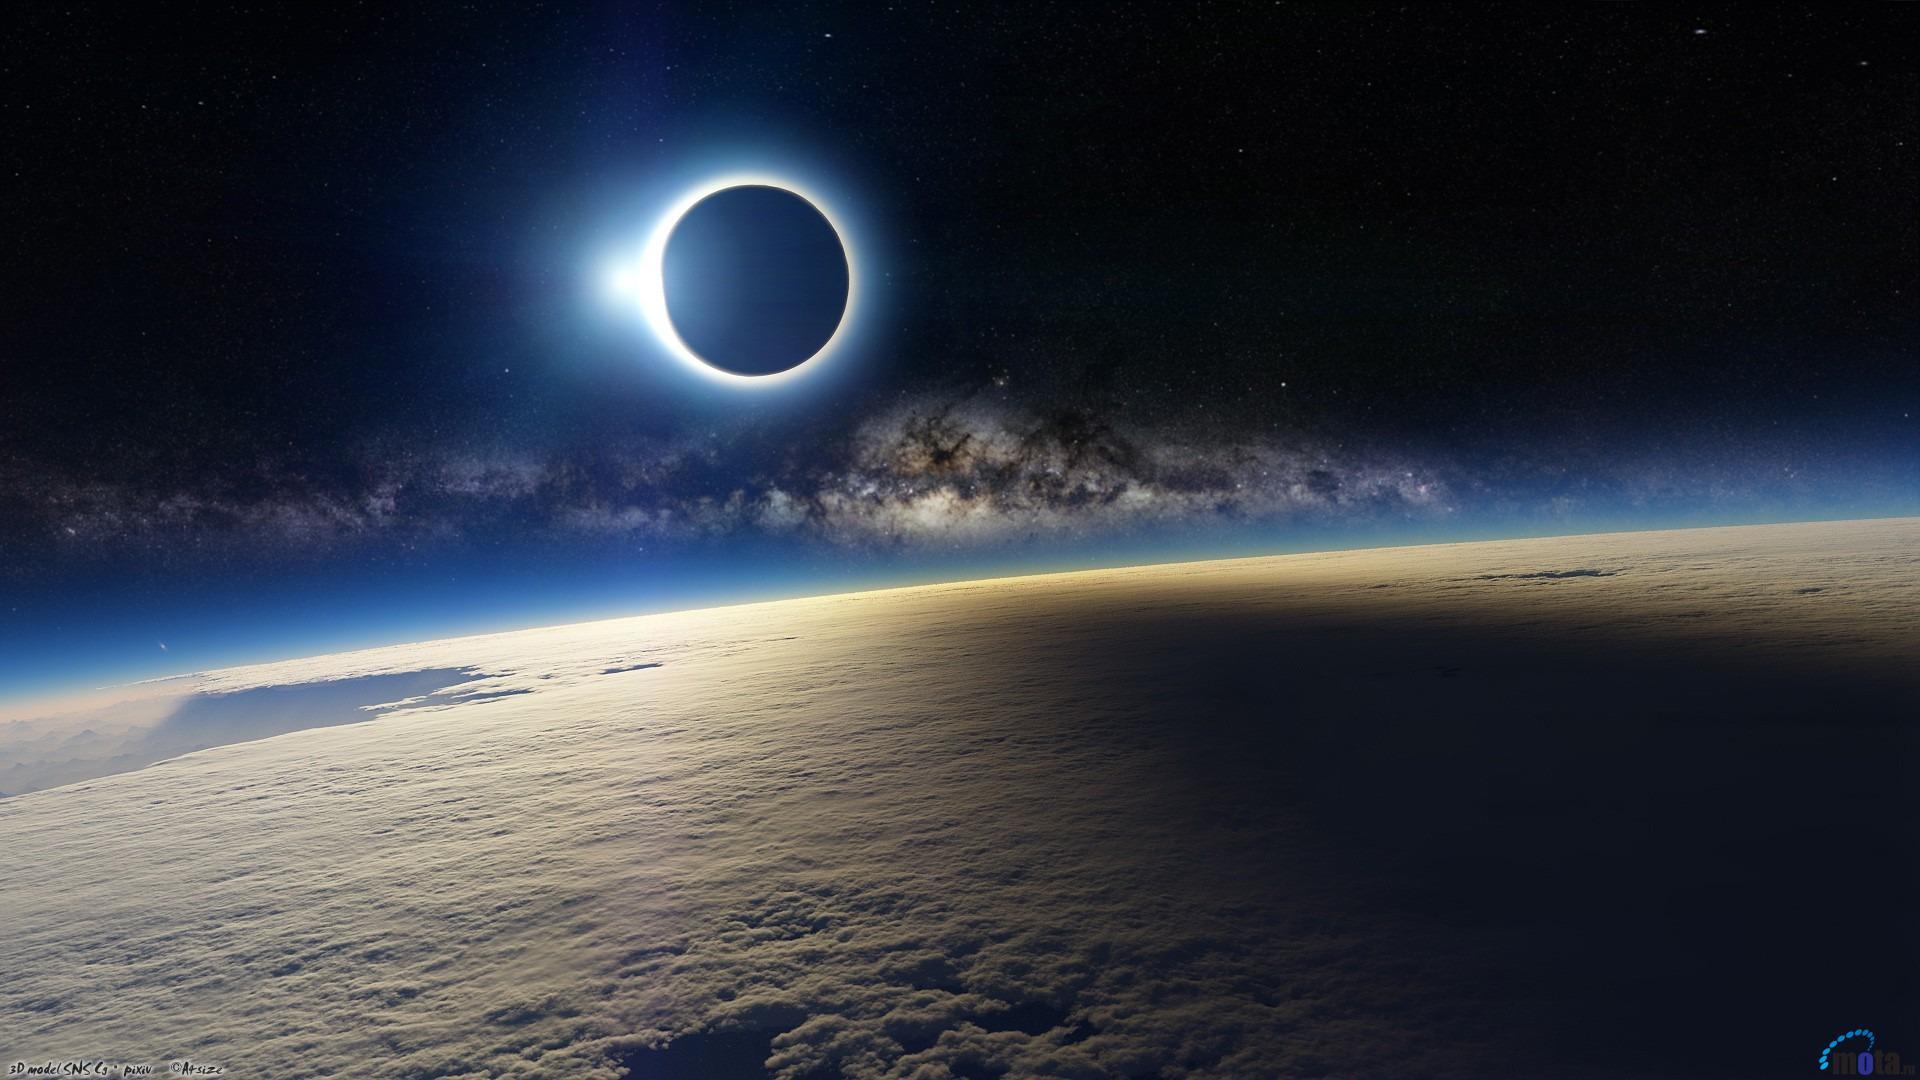 Download Wallpaper 3D Solar Eclipse 1920 x 1080 HDTV 1080p Desktop 1920x1080